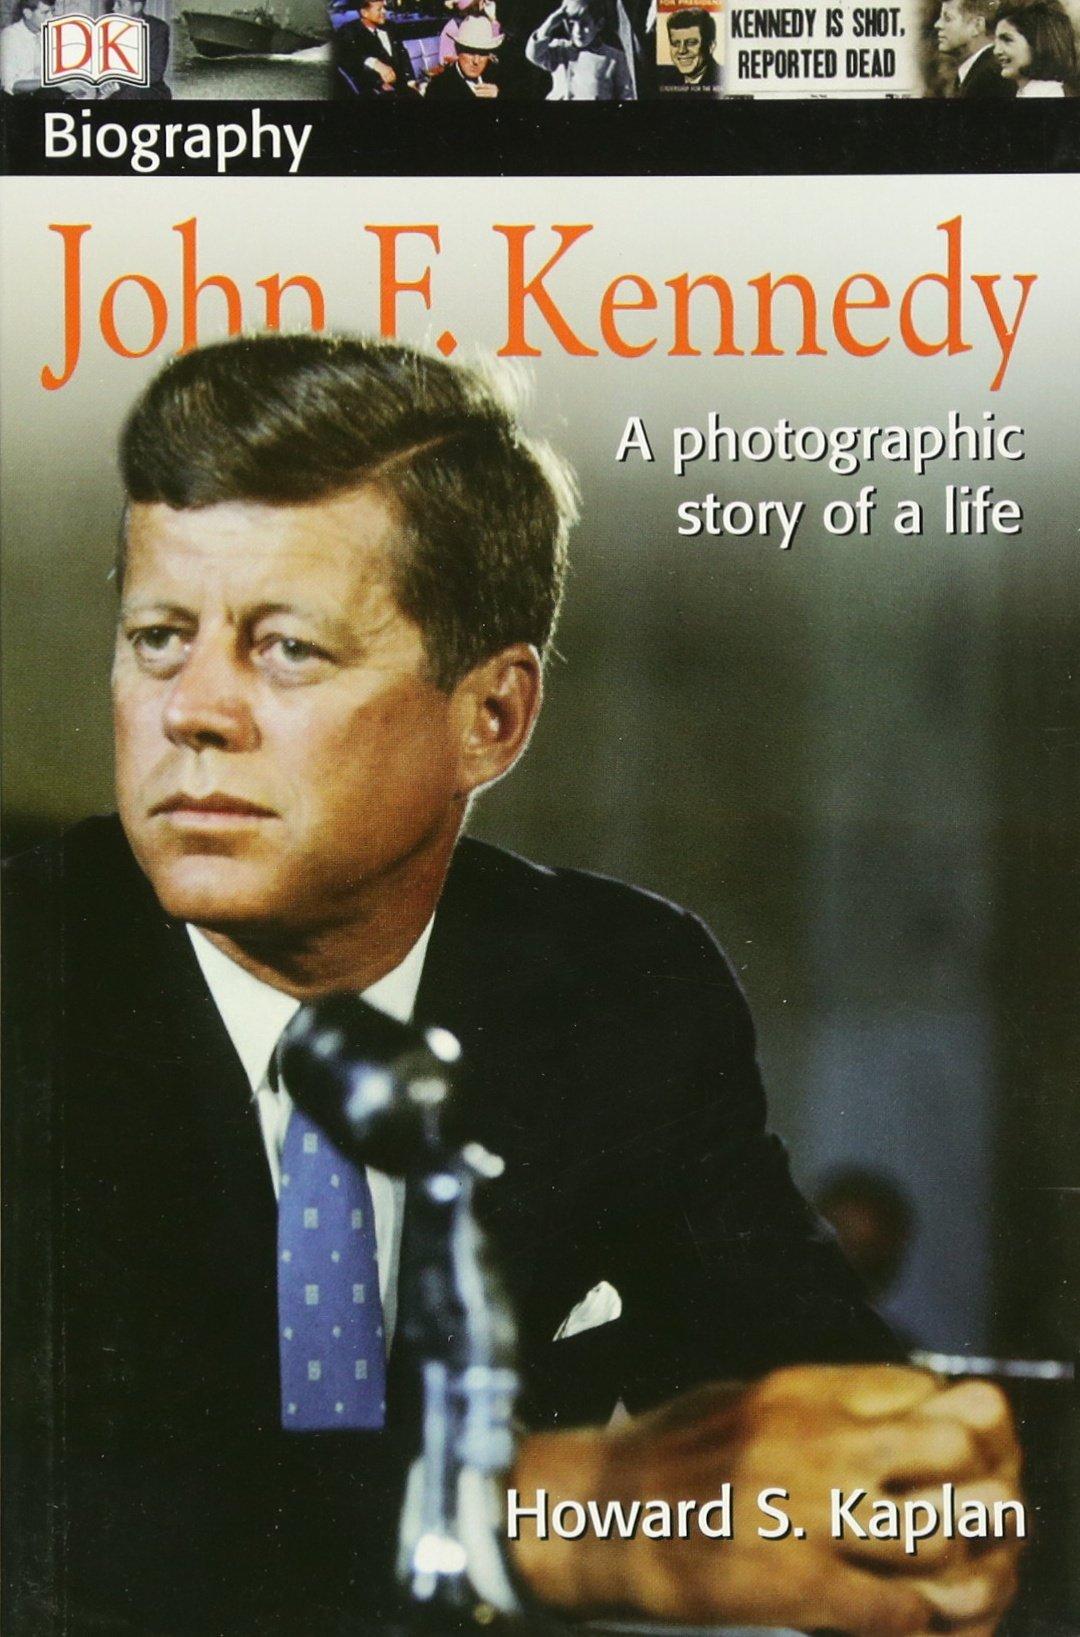 dk-biography-john-f-kennedy